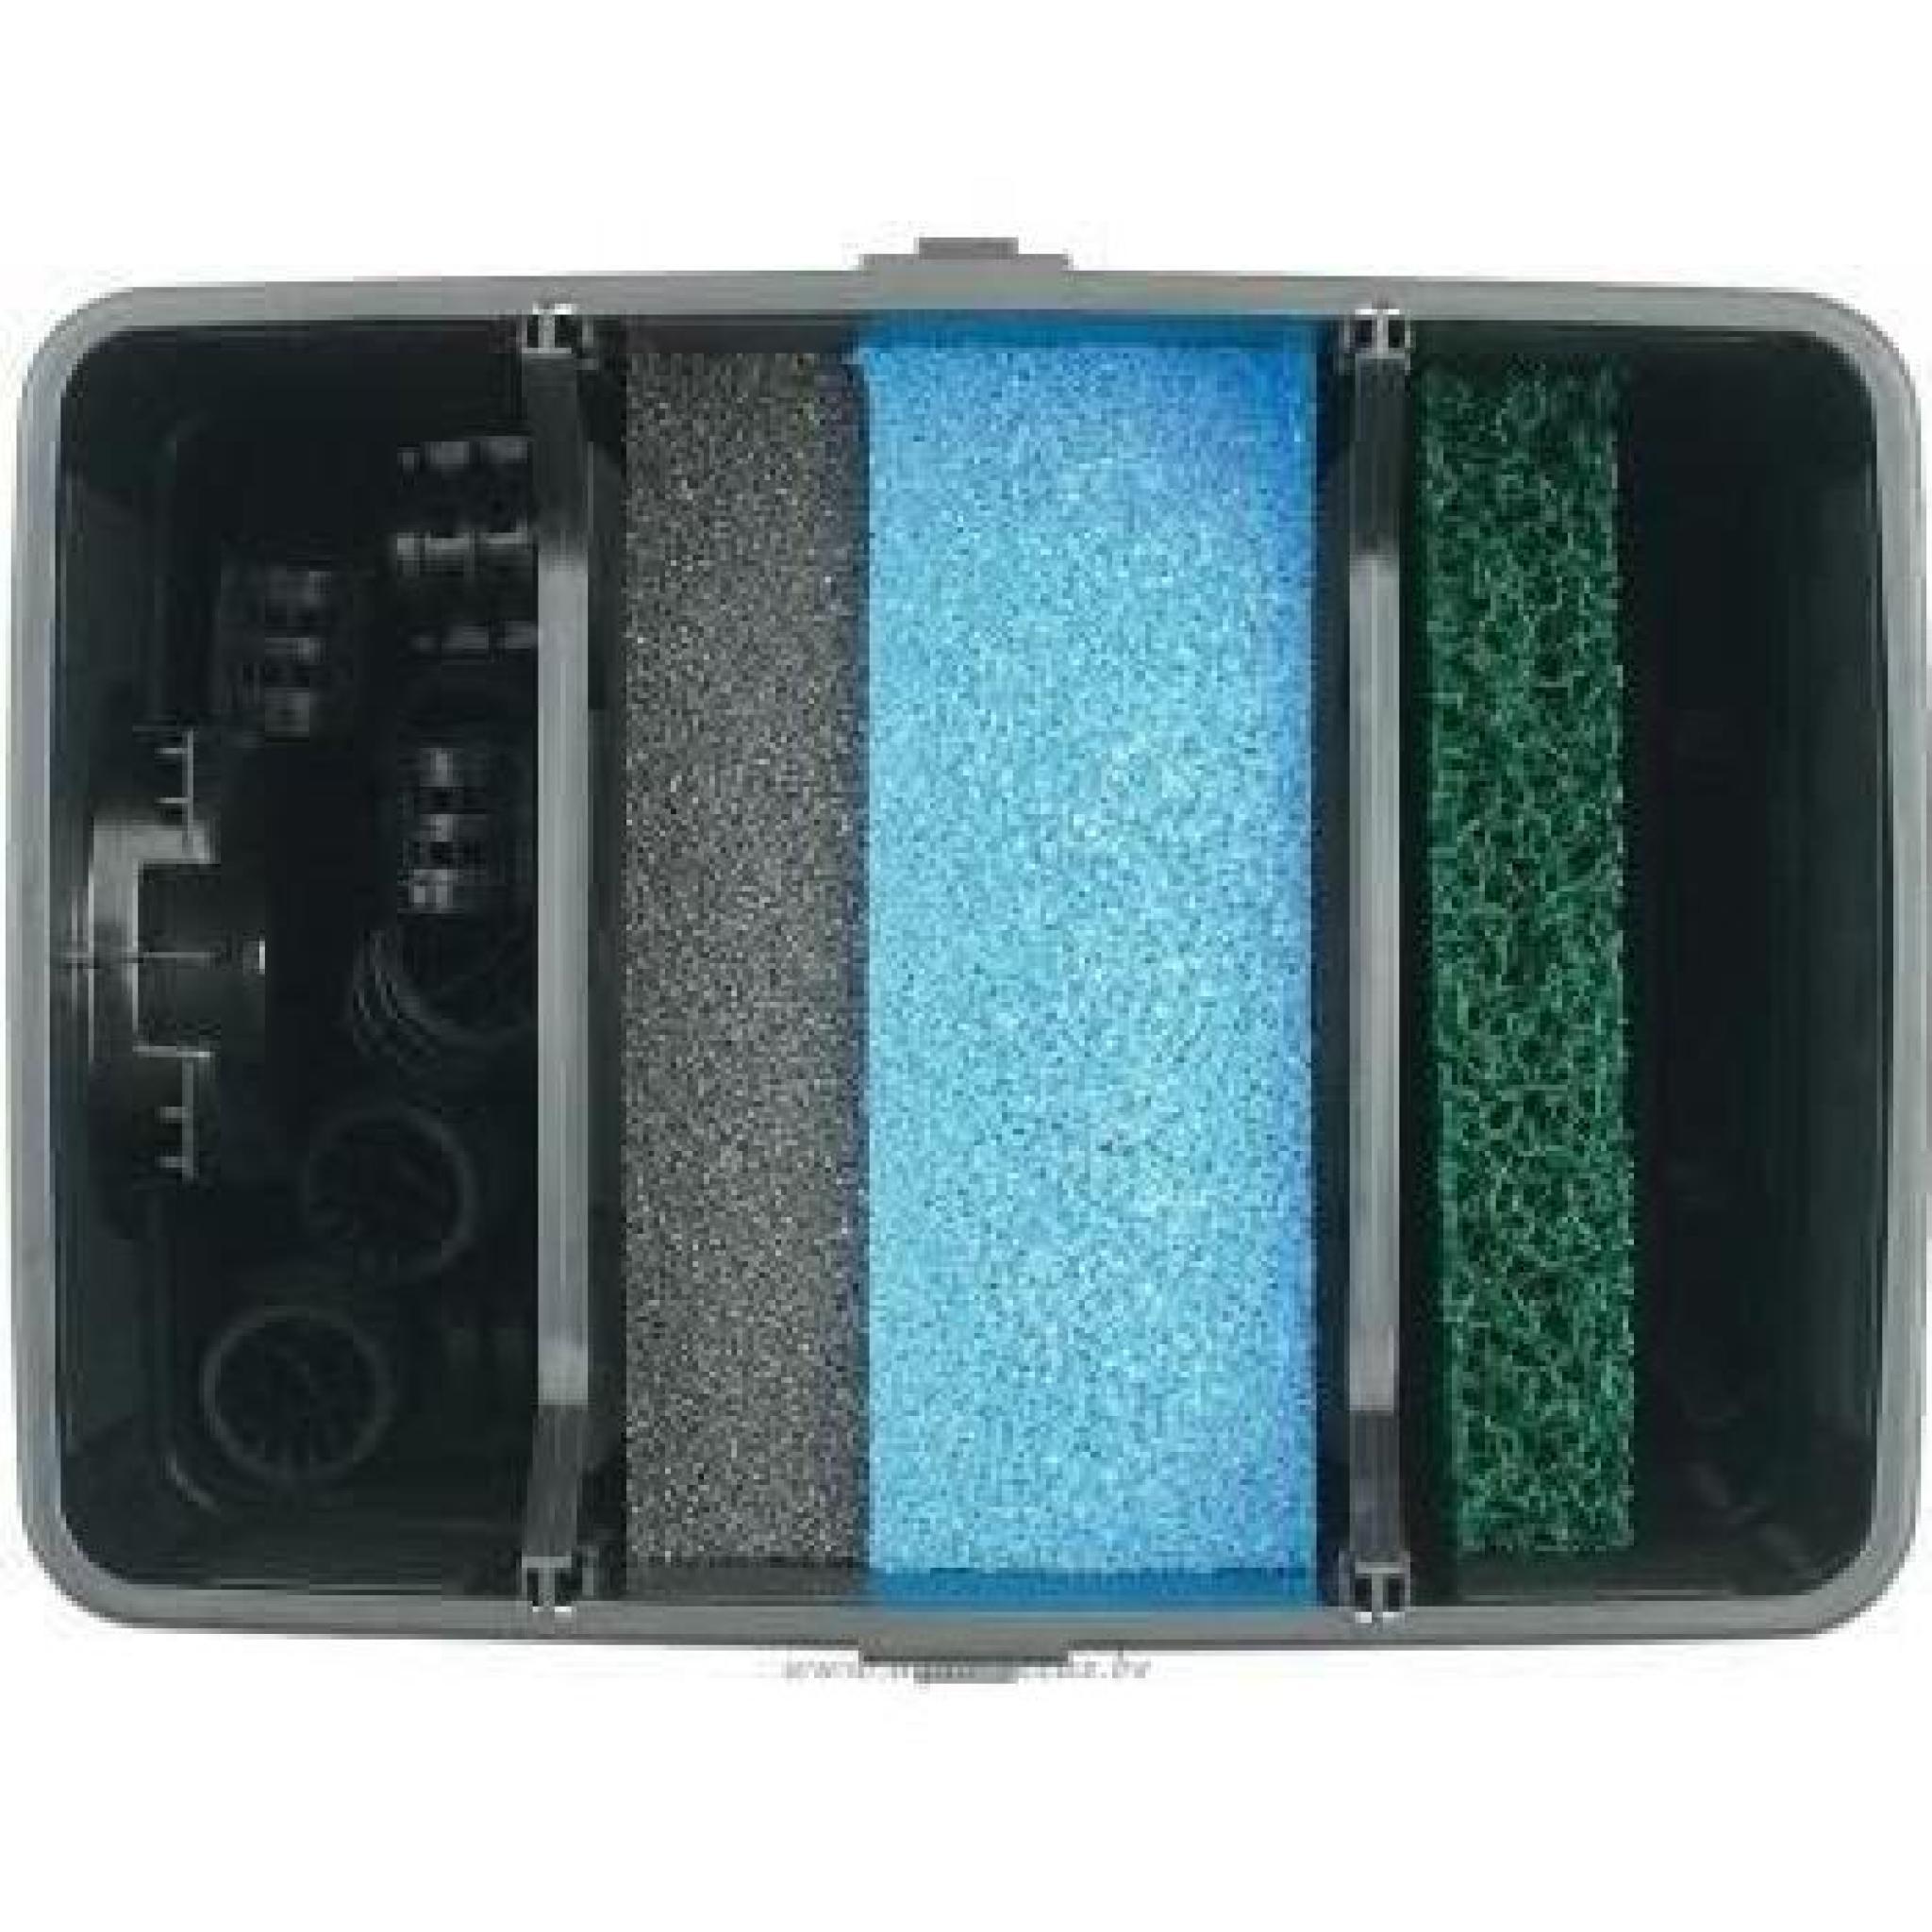 Filtration compl te avec u v pour bassin de jardin 4000 for Kit filtration bassin pas cher